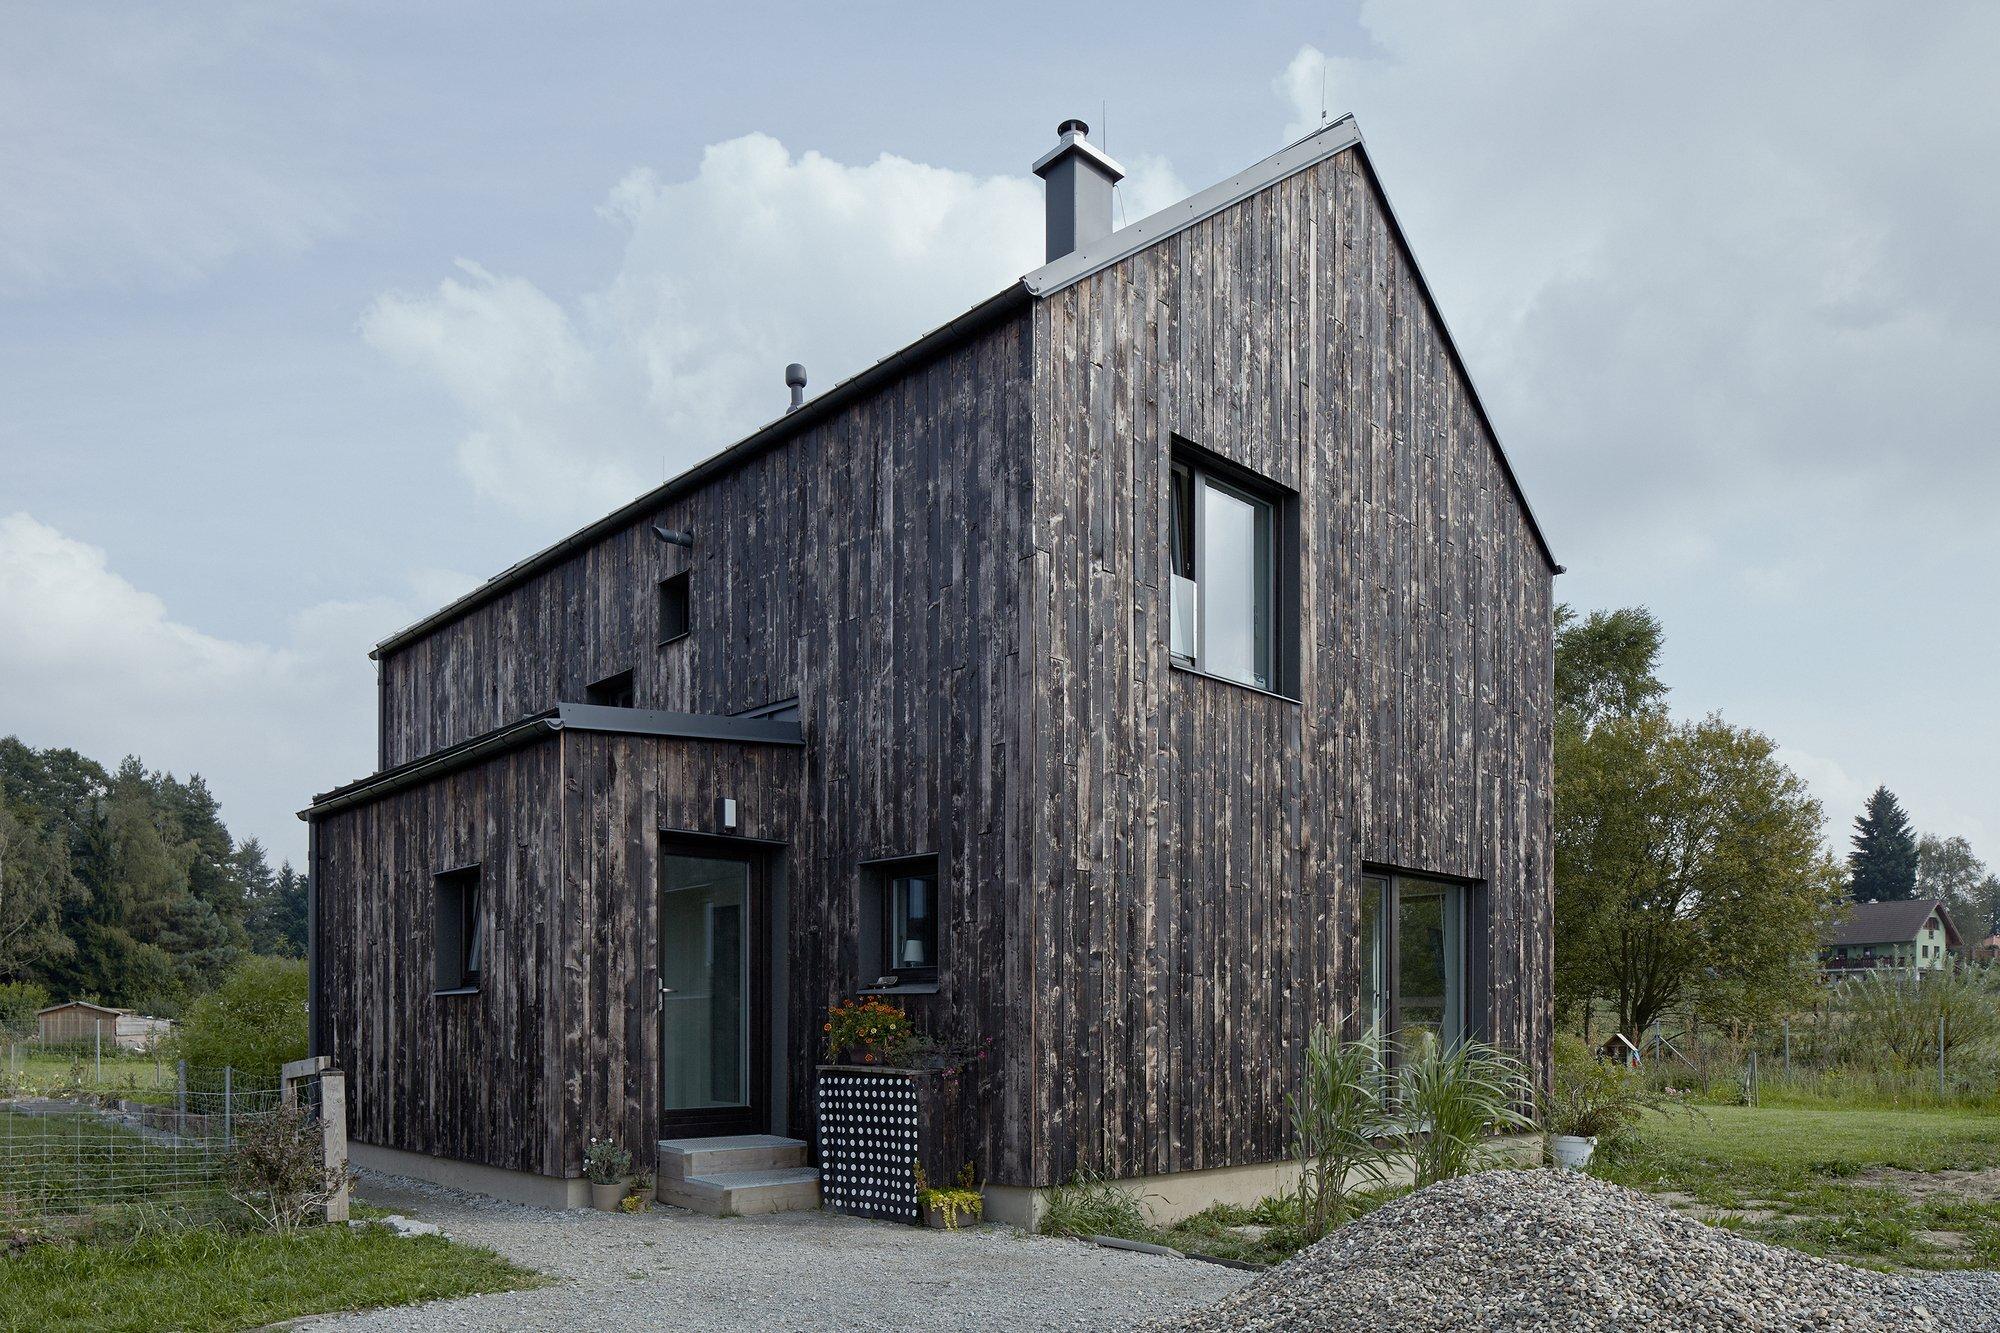 The Dog House - Small House - Mjölk architekti - Czech Republic - Exterior - Humble Homes